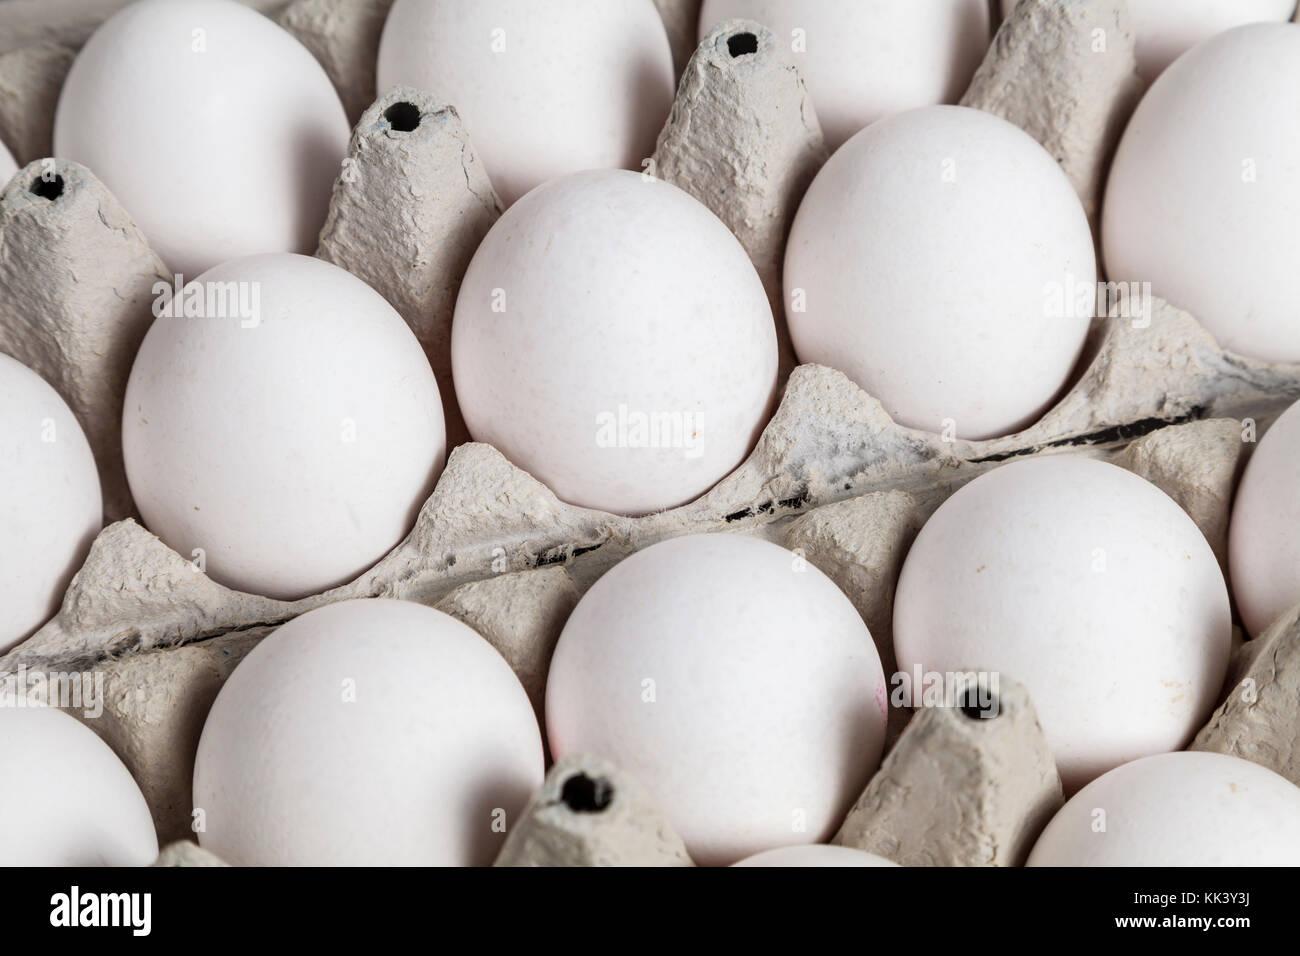 Huevos en una caja Foto de stock